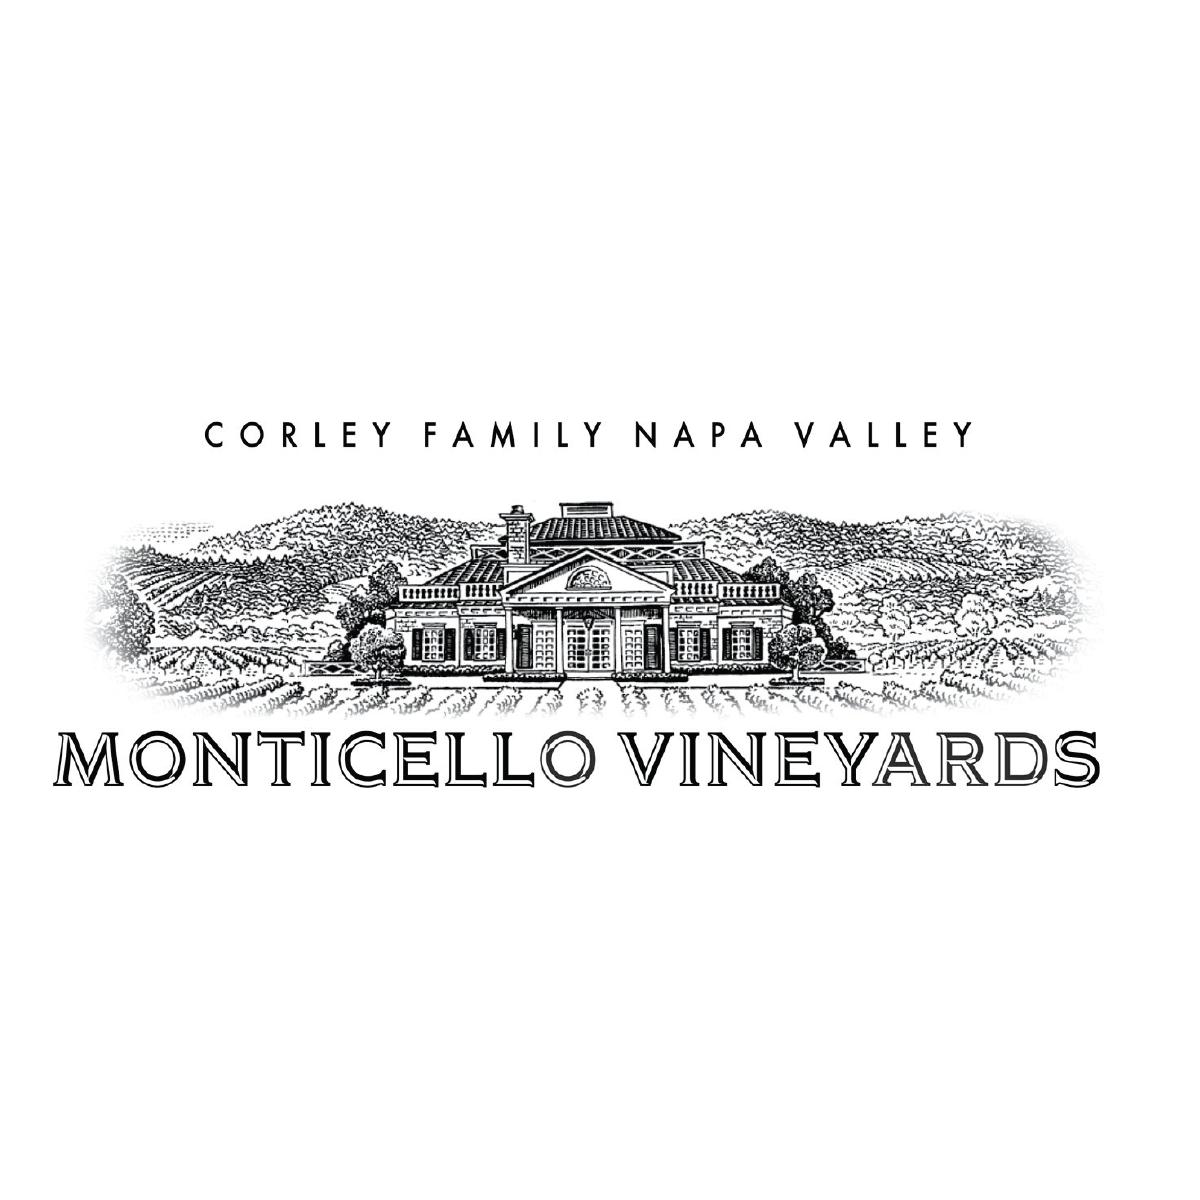 Corley Family / Monticello